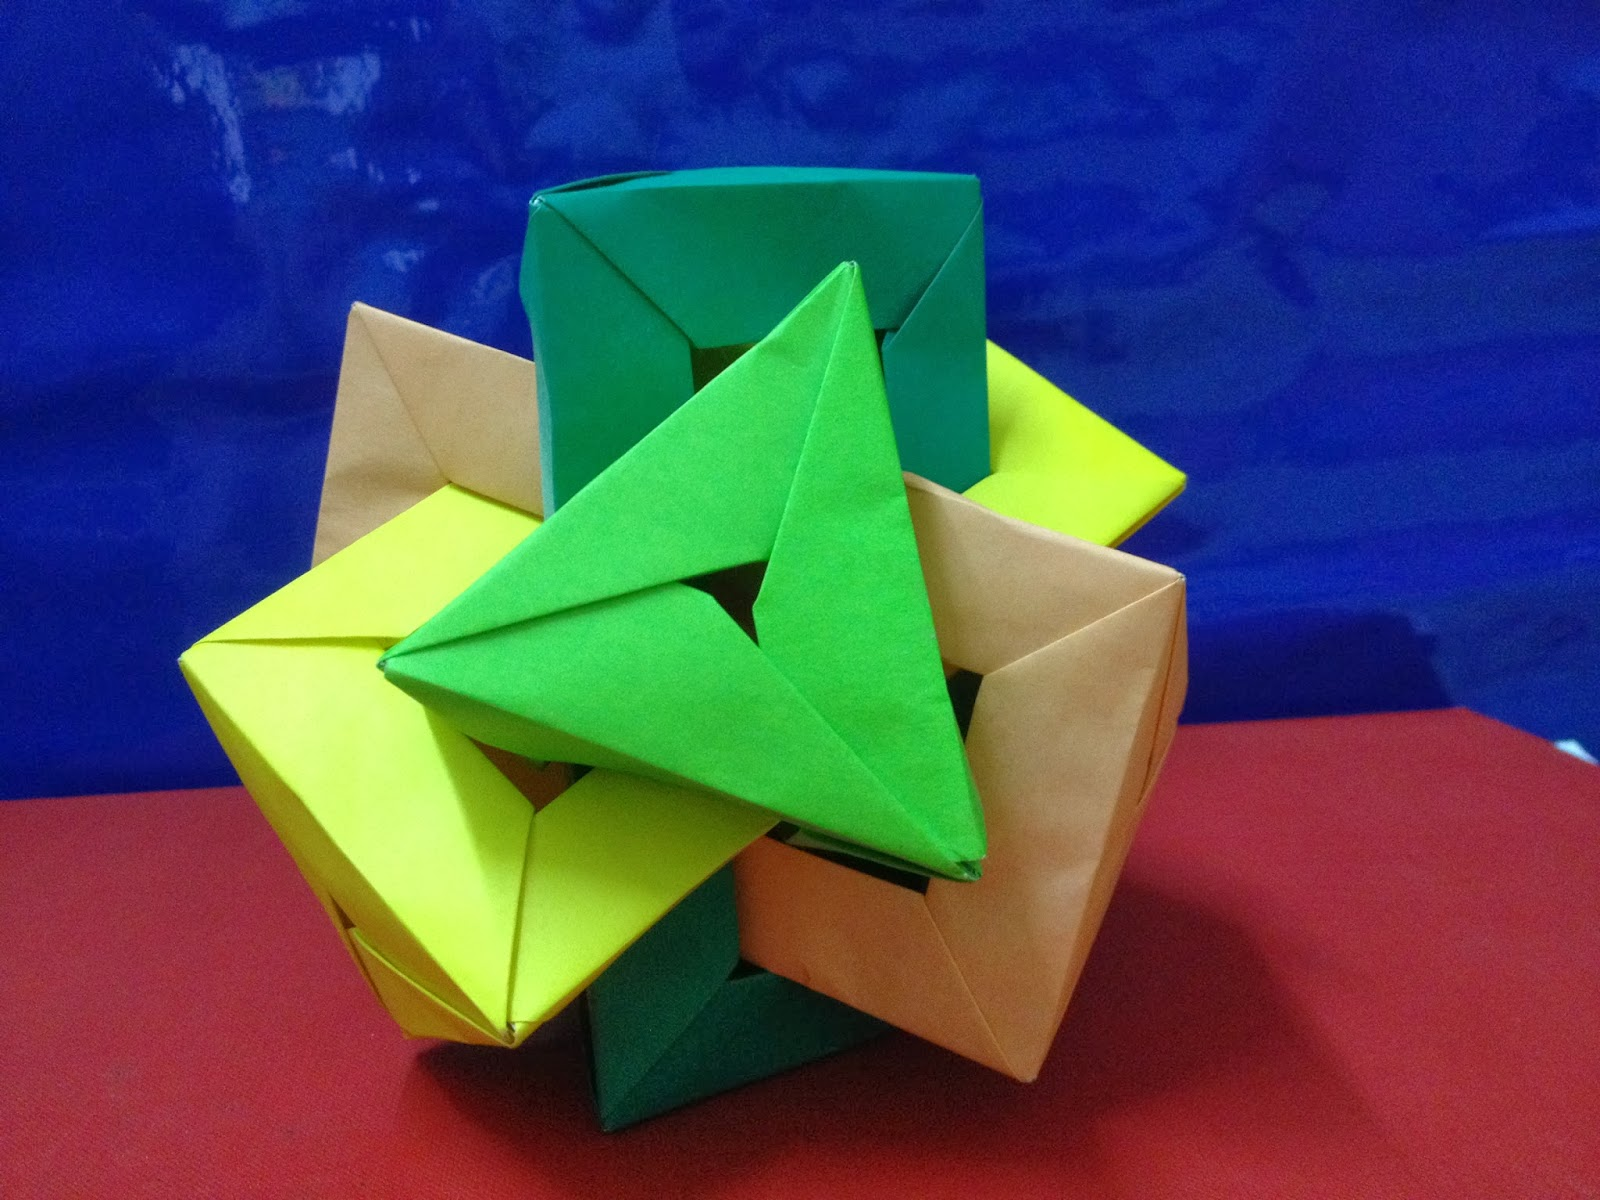 Icosahedron Stellations by Daniel Kwan   1200x1600